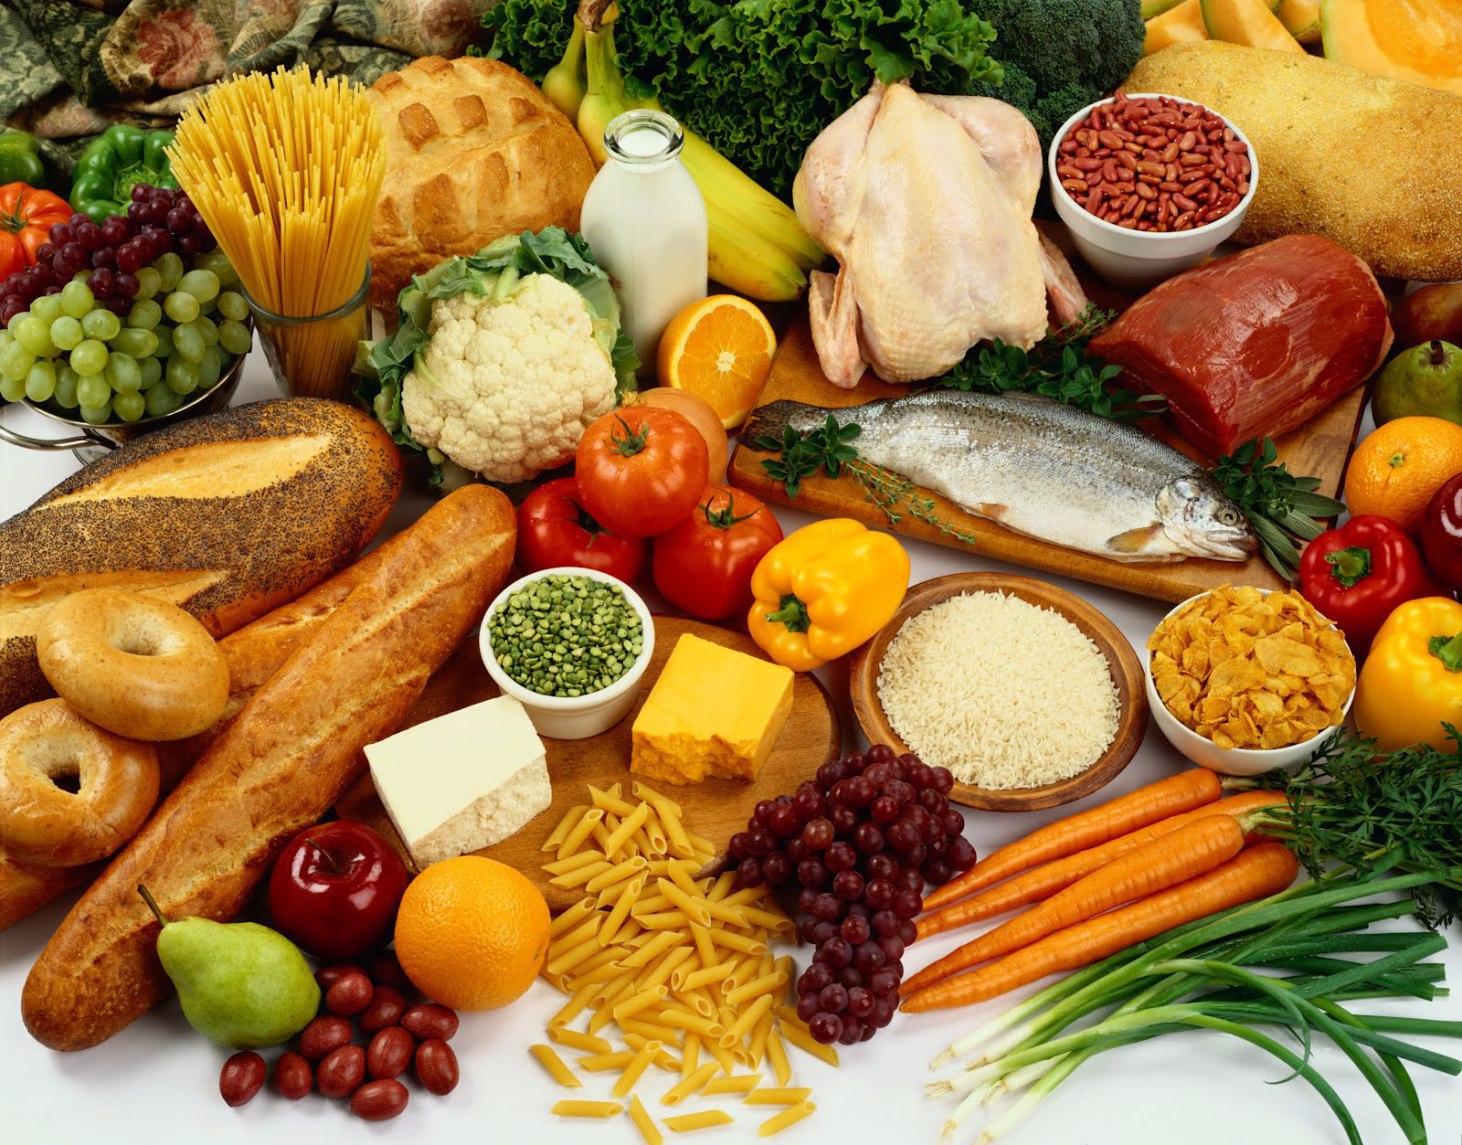 food-item-prices